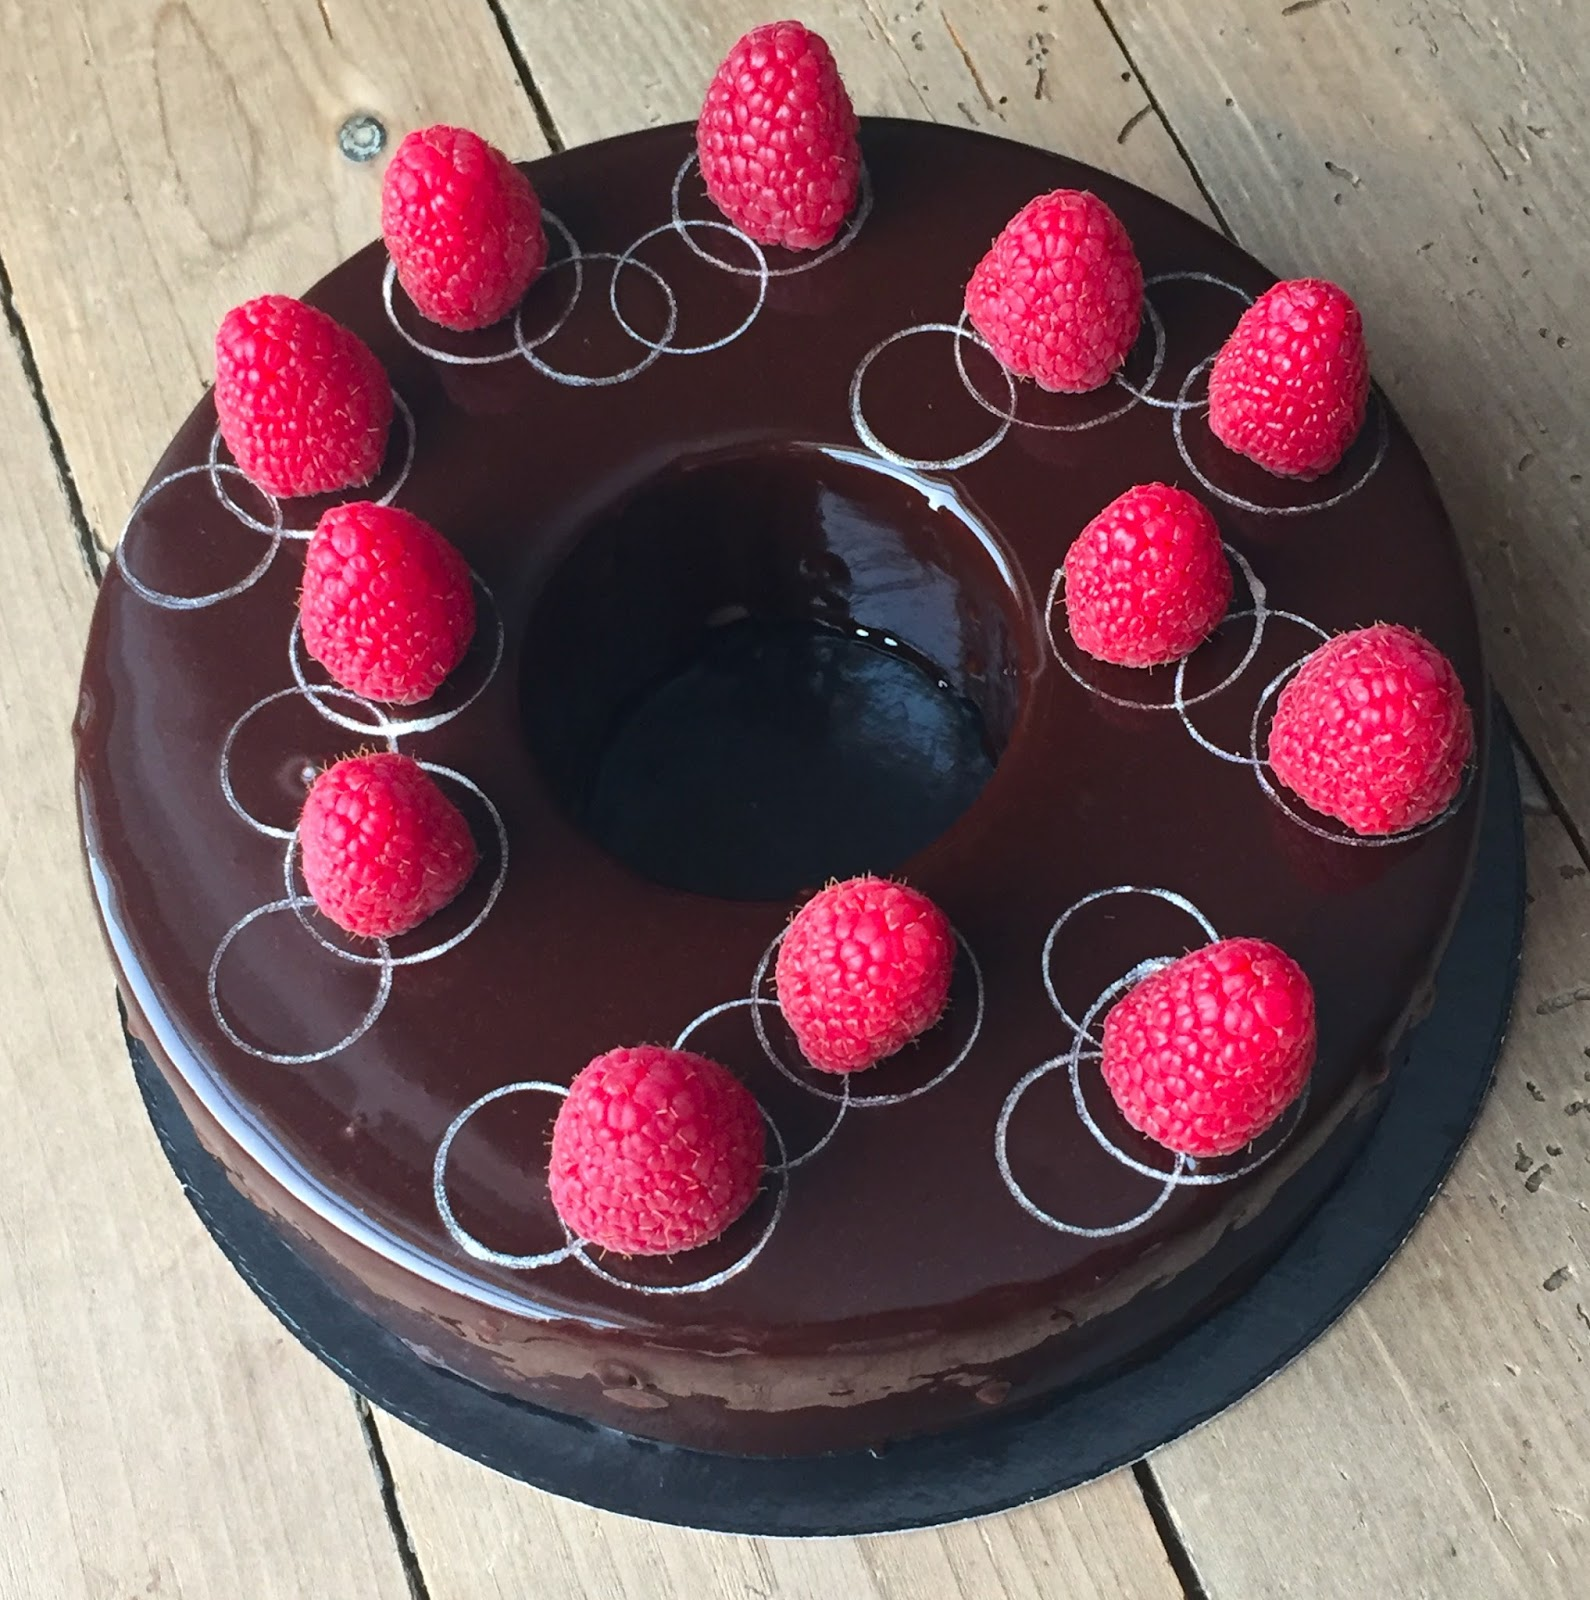 J En Reste Baba Entremets Chocolat Noir Framboises